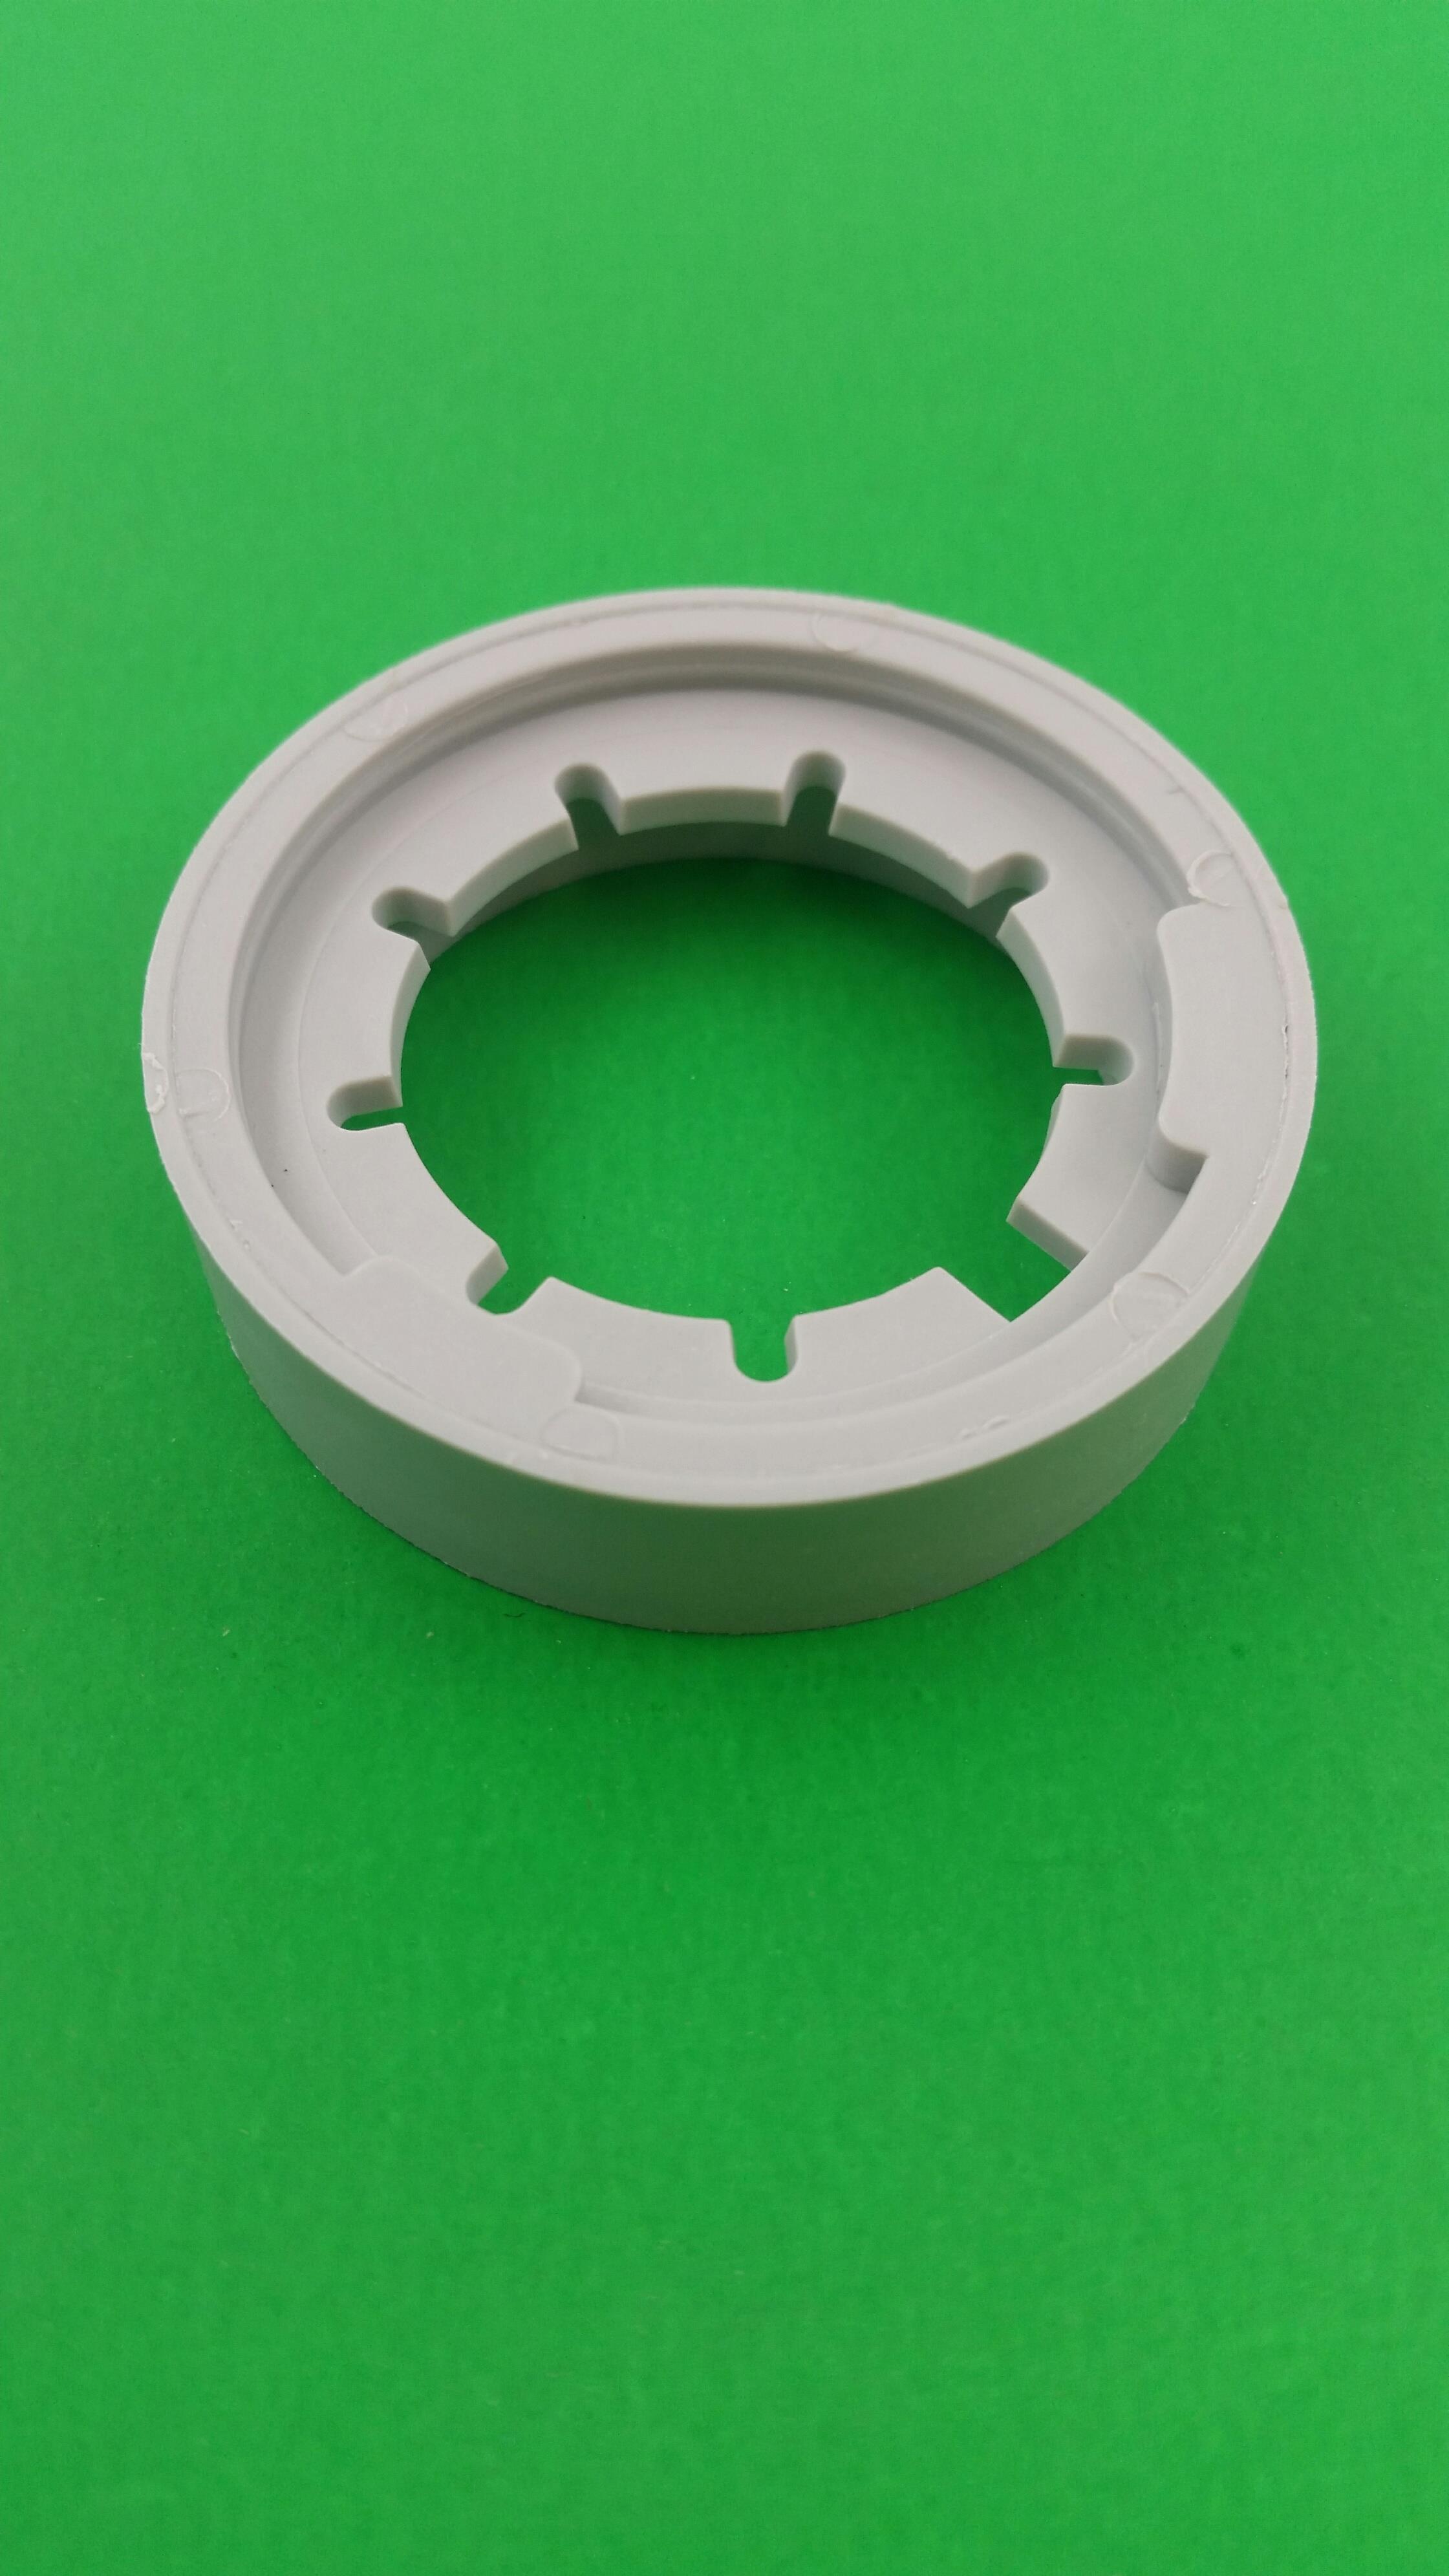 Cummins Onan 166 0767 Ignition Rotor P216g P218g P220g